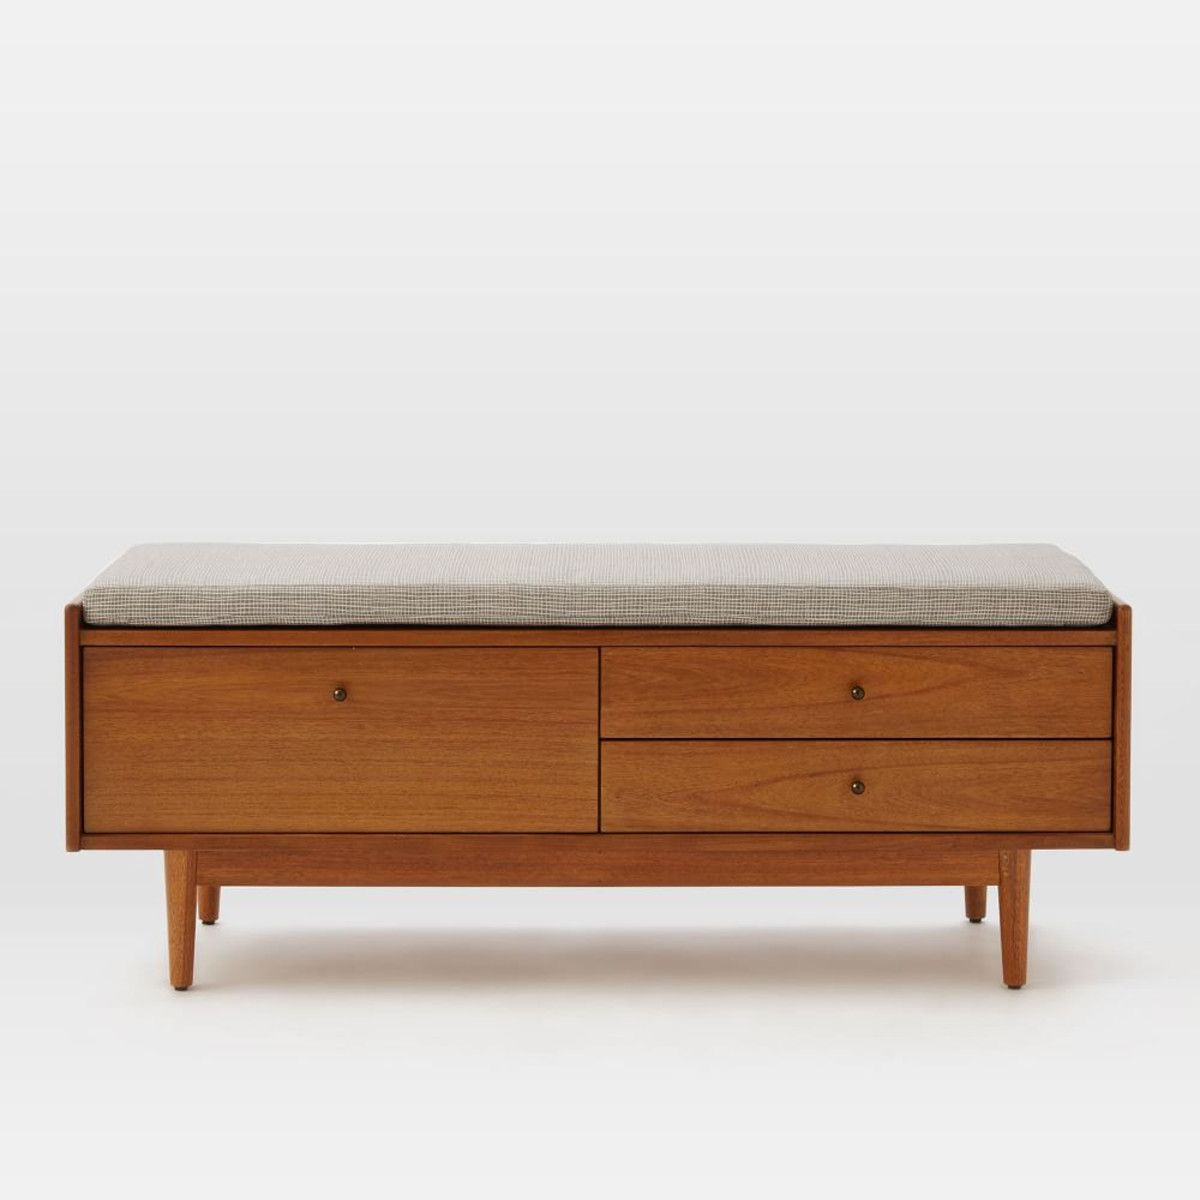 Modern Furniture Home Decor Home Accessories West Elm Mid Century Entryway Mid Century Storage Furniture